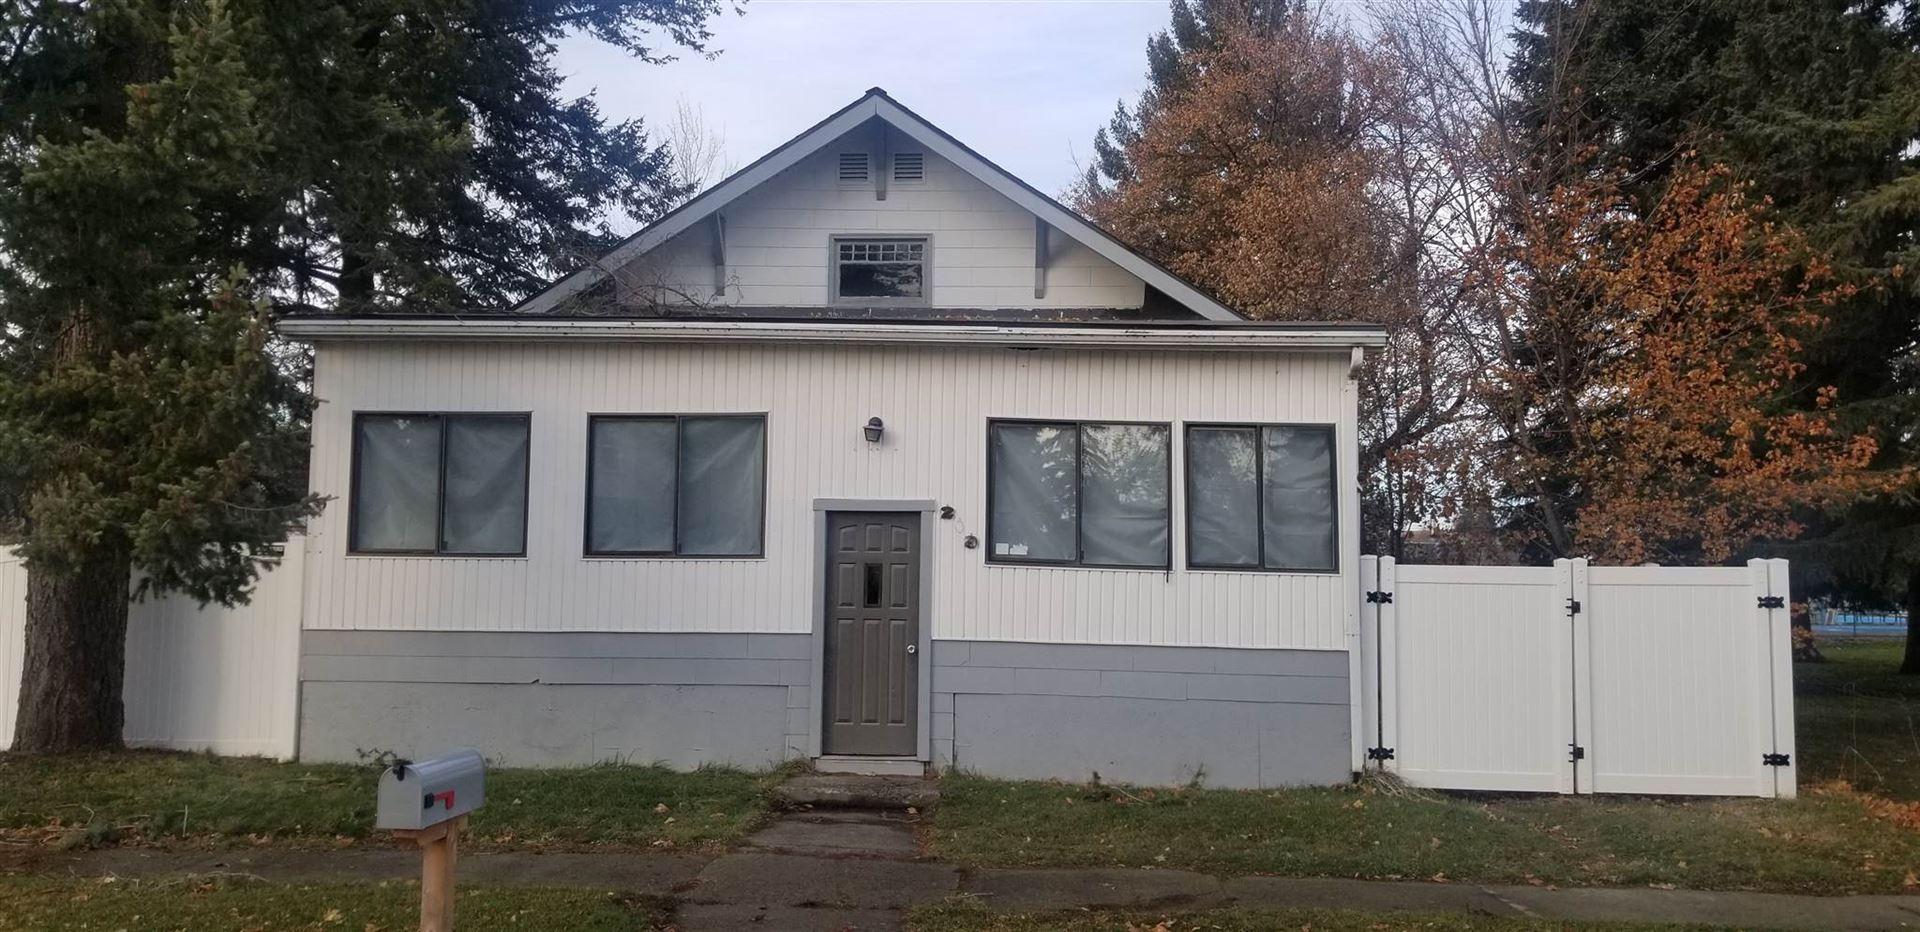 206 W Steptoe Ave, Oakesdale, WA 99158 - #: 202025665